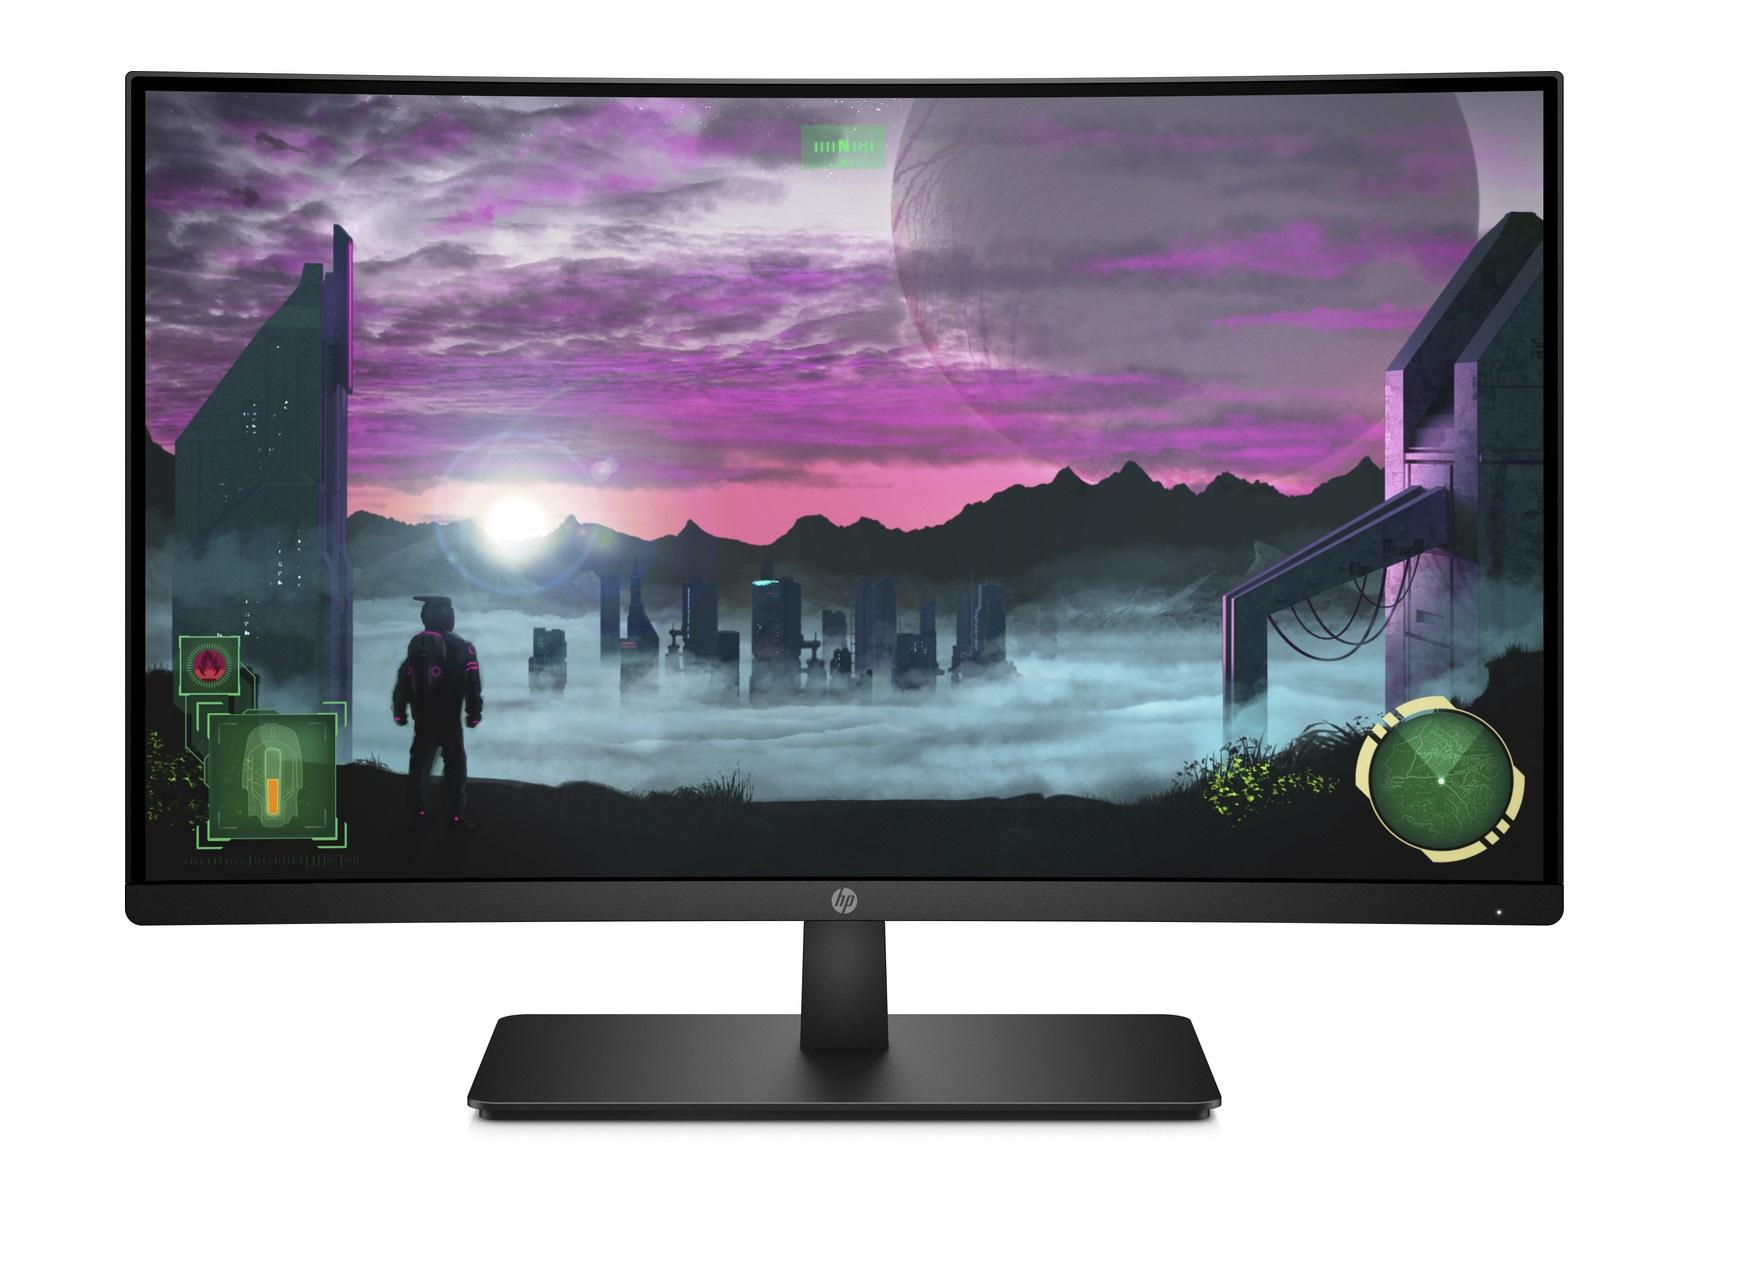 "Écran PC incurvé 27"" HP 27x - full HD, LED VA, 144 Hz, 5 ms, FreeSync (via ODR de 50€)"